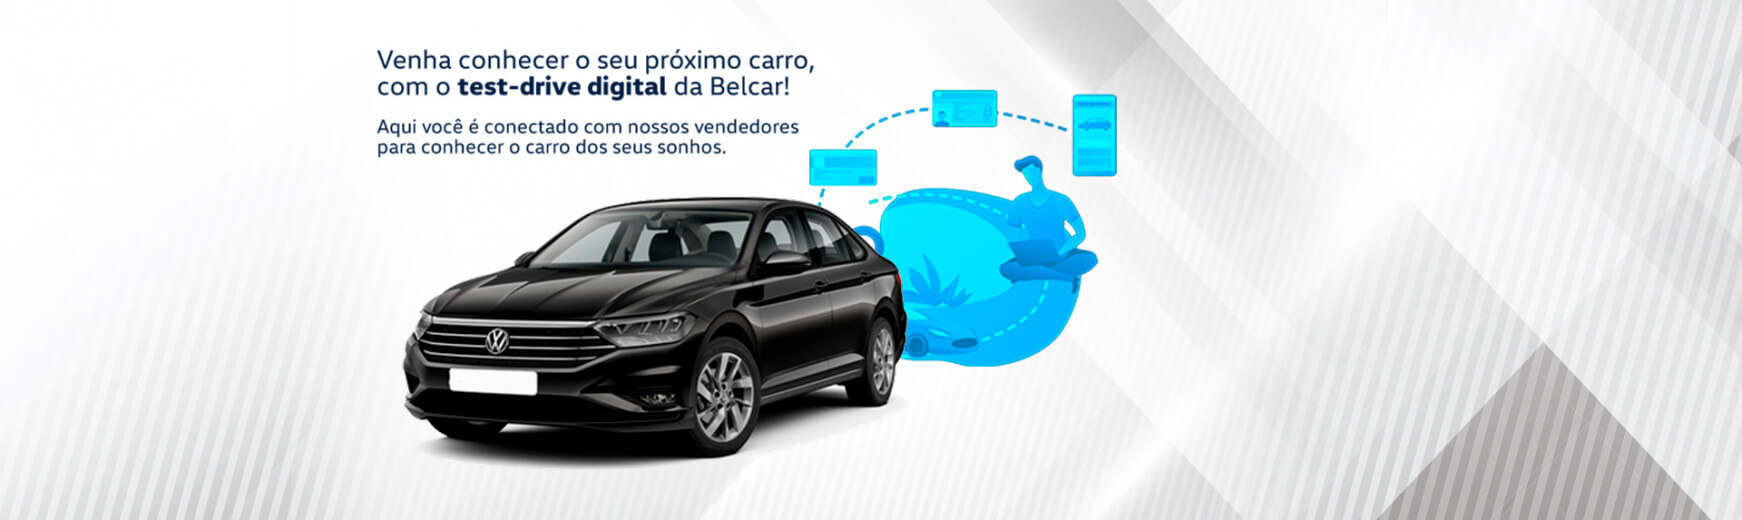 CONFIRA O TEST-DRIVE DIGITAL